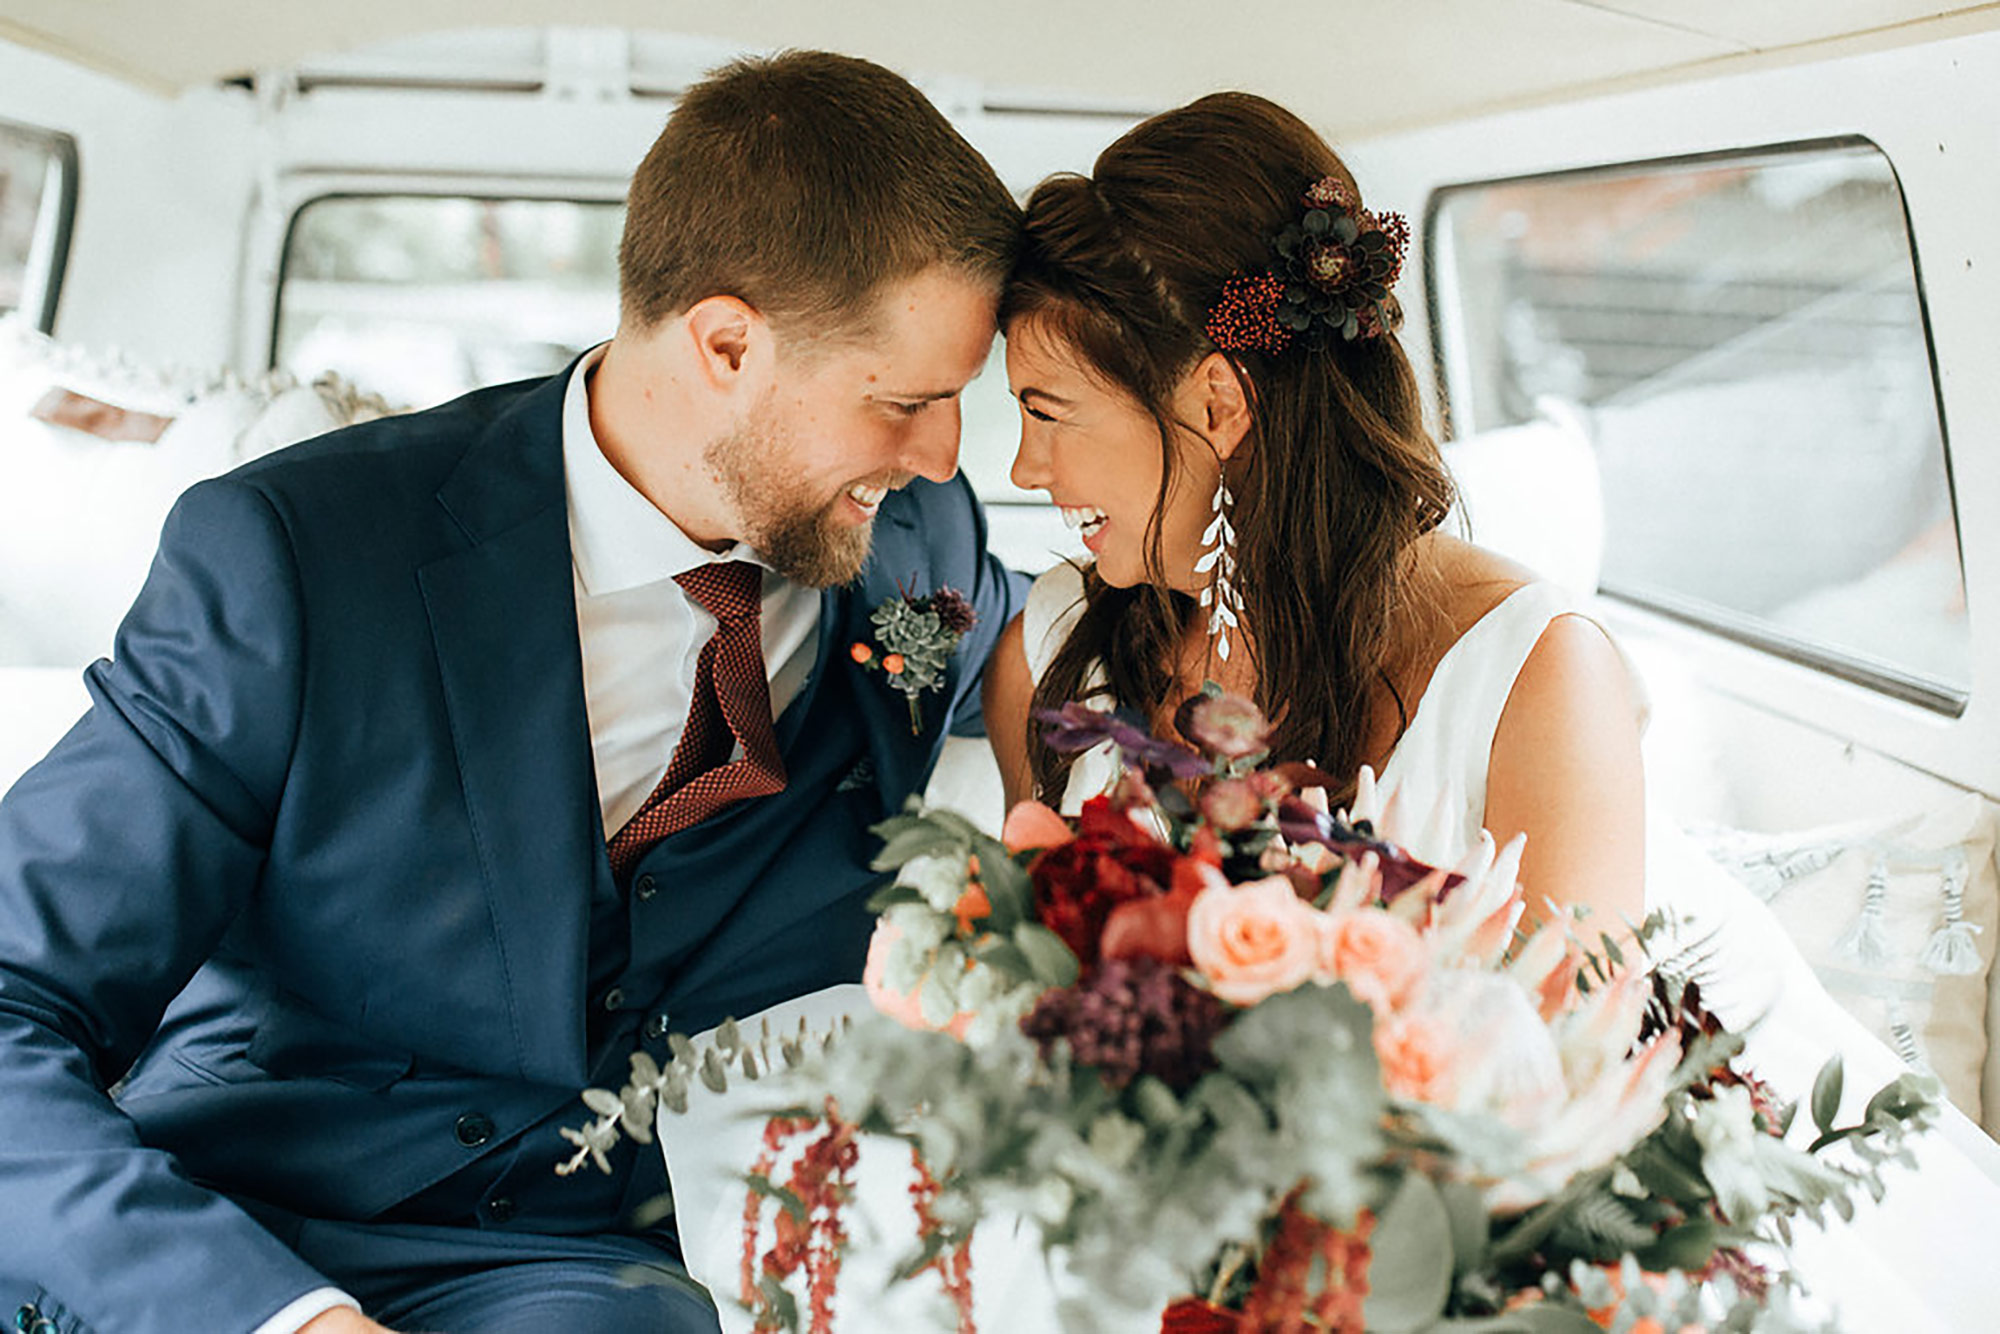 Kurtz-Orchards-Wedding-Niagara-wedding-Vineyard-Bride-Photography-by-Kayla-Rocca-008.JPG